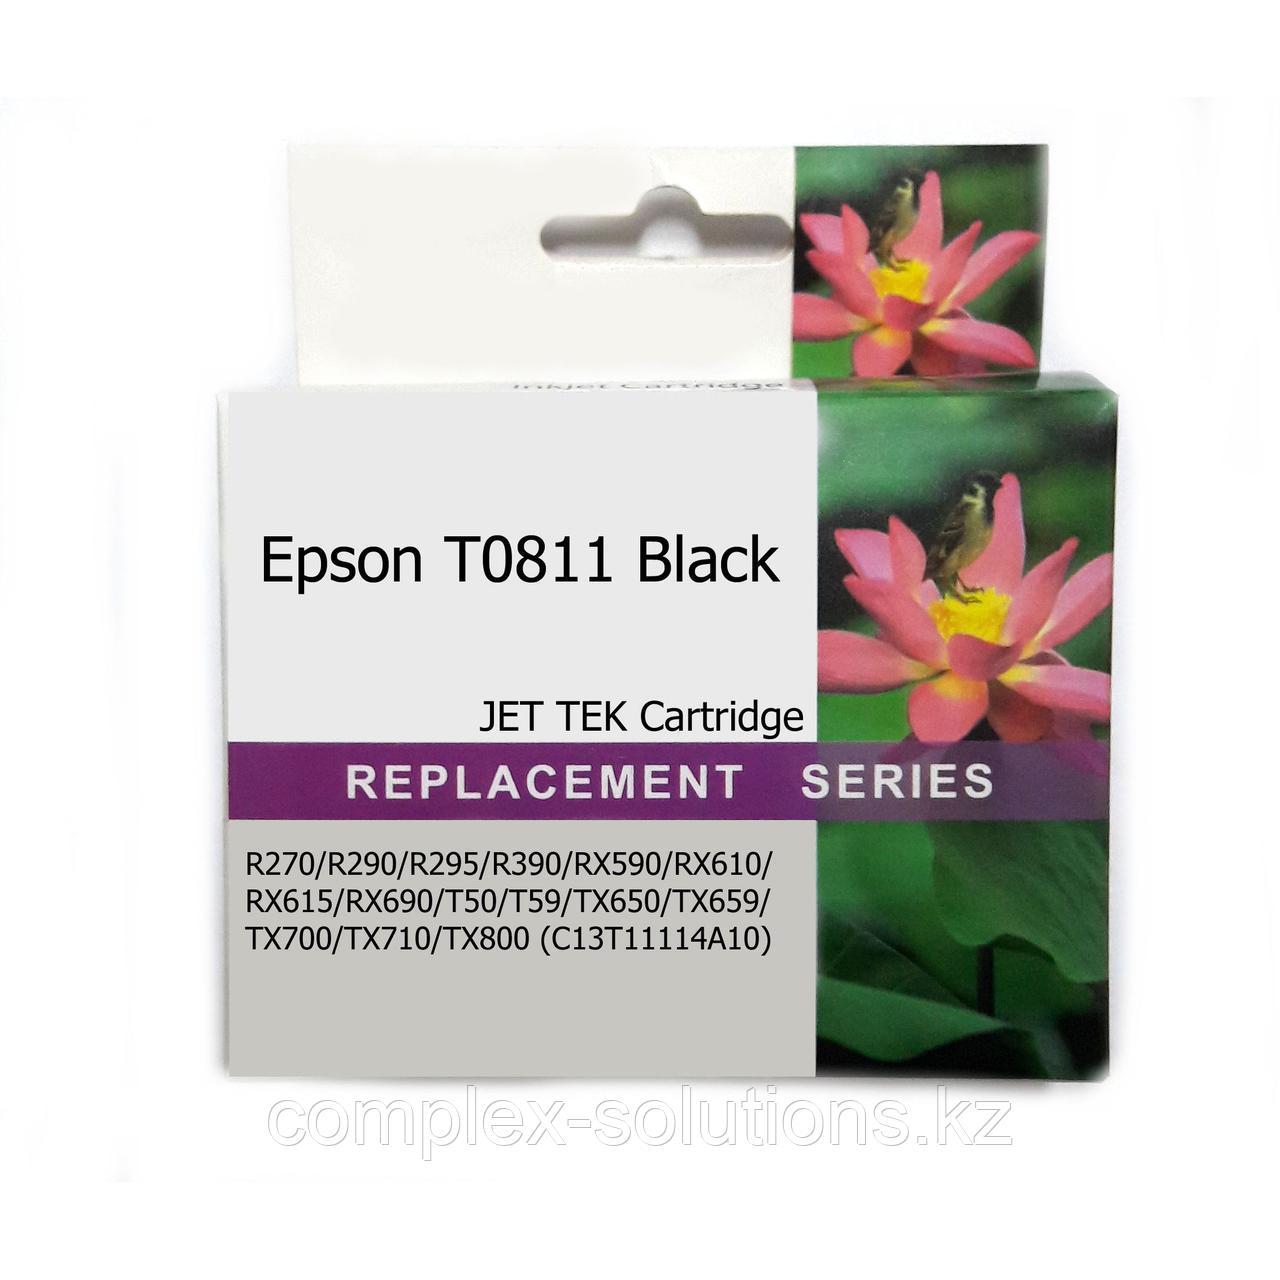 Картридж EPSON T0811 Black JET TEK | [качественный дубликат]